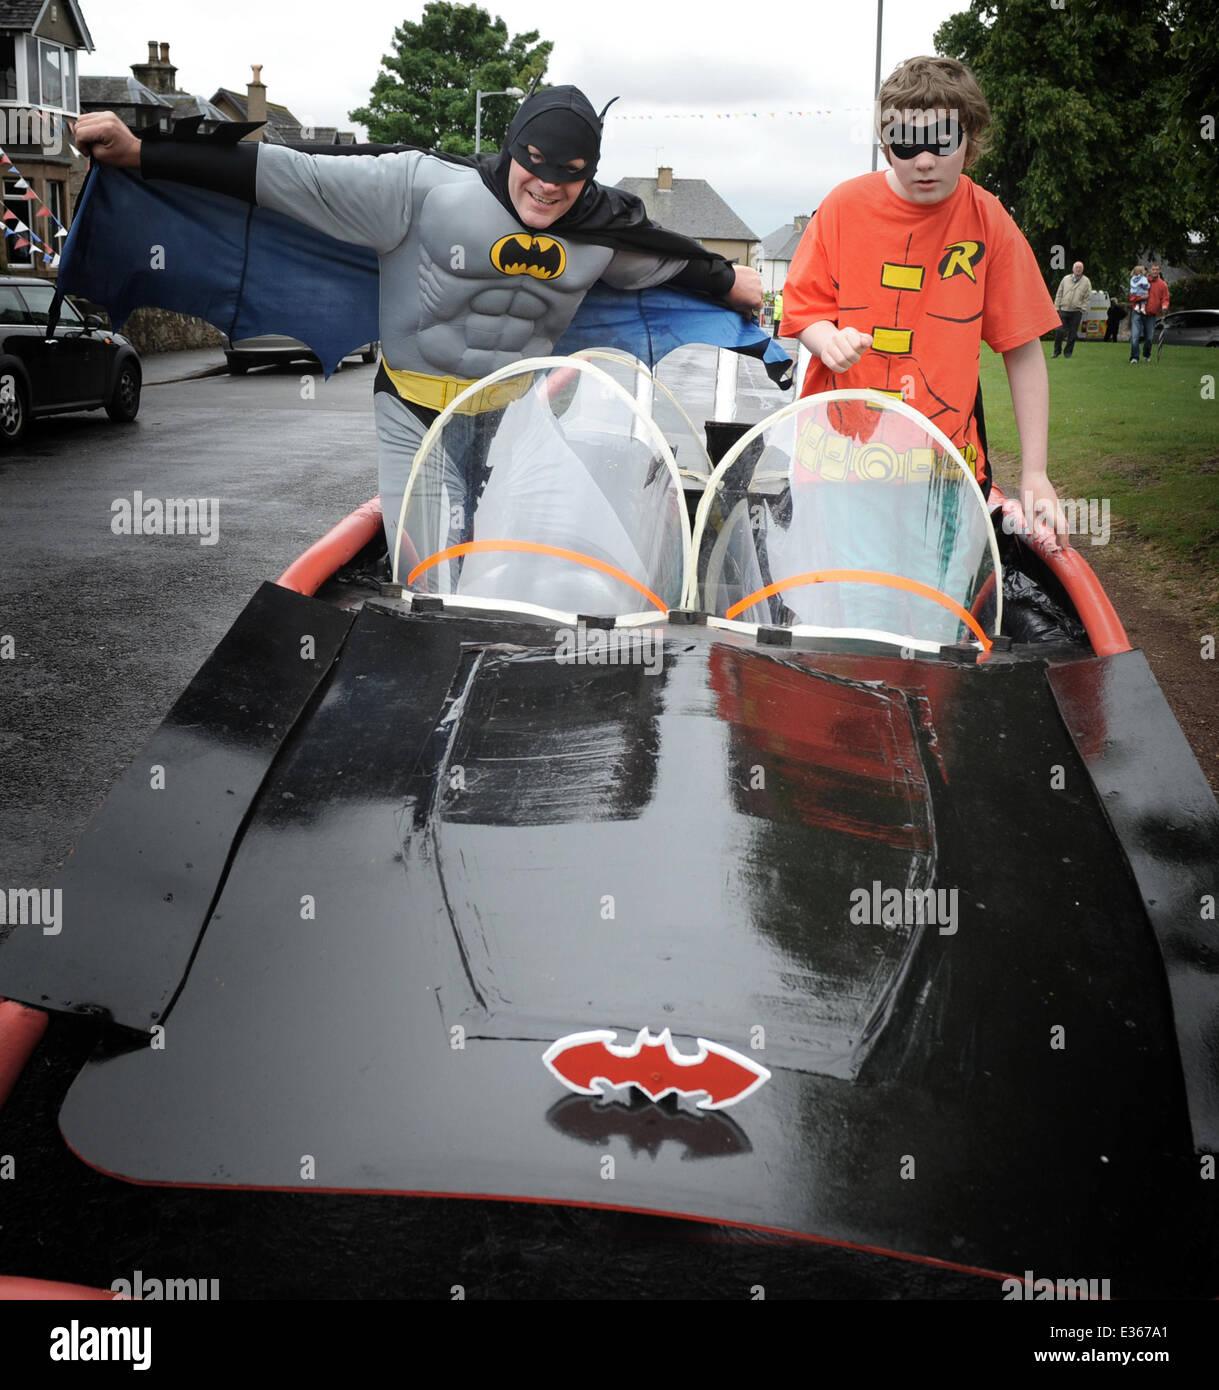 Batman Robin Batmobile Imágenes De Stock & Batman Robin Batmobile ...